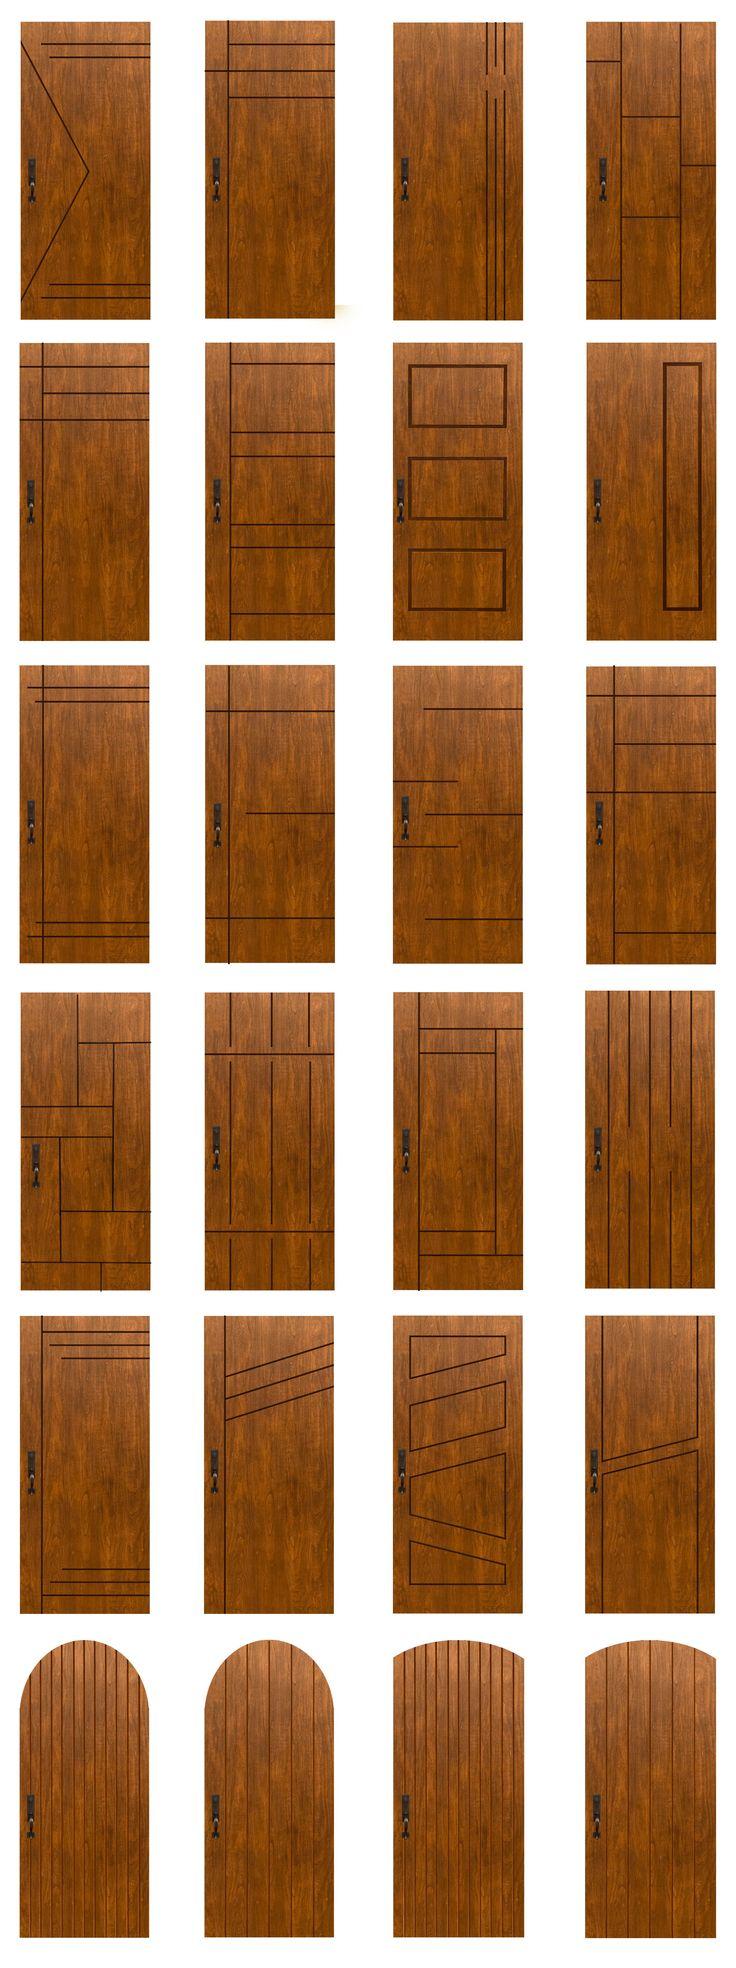 MasterGrain's Contemporary Design Possibilities. Custom CNC machined looks for endless possibilities! #Contemporary #Modern #CNC #Custom #Premium #Fiberglass #Doors #MasterGrain